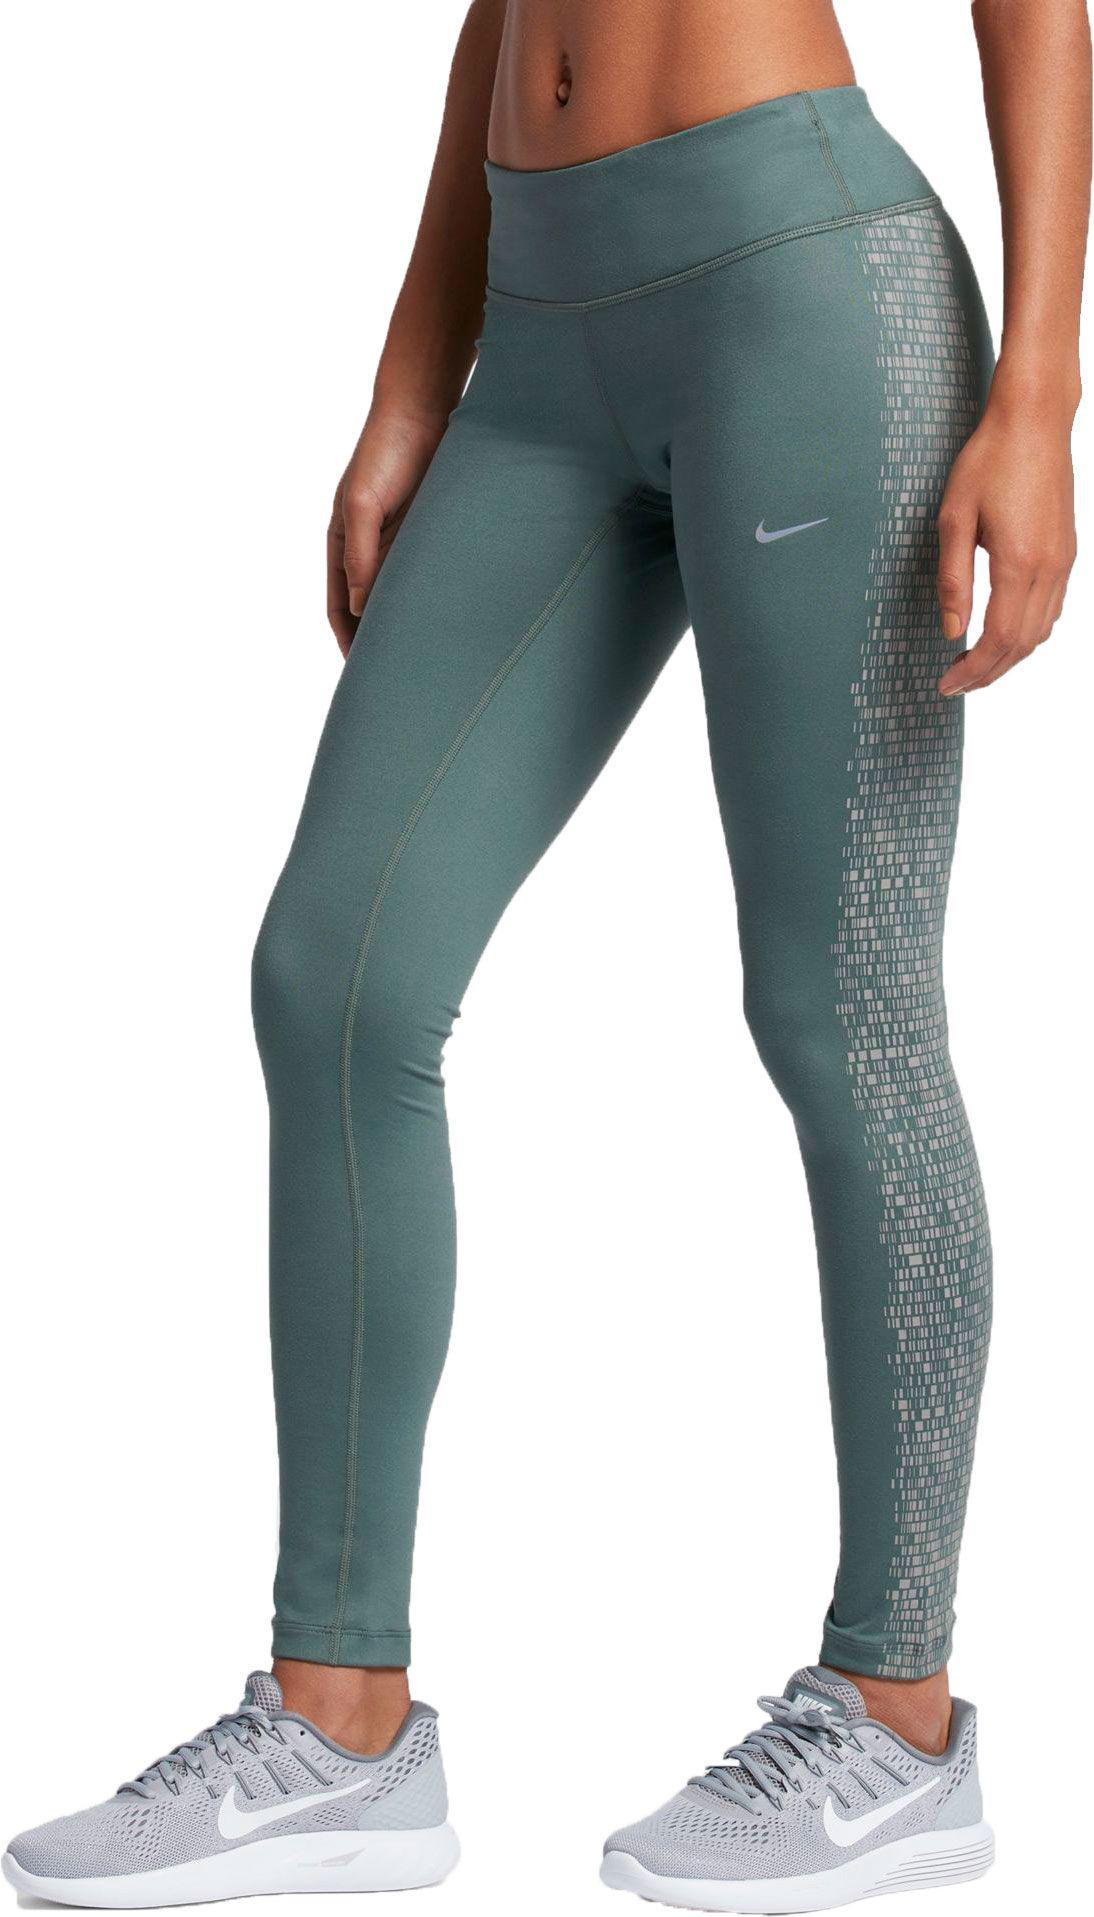 3c78399c8ea890 Nike Power Flash Epic Running Tights - Lyst